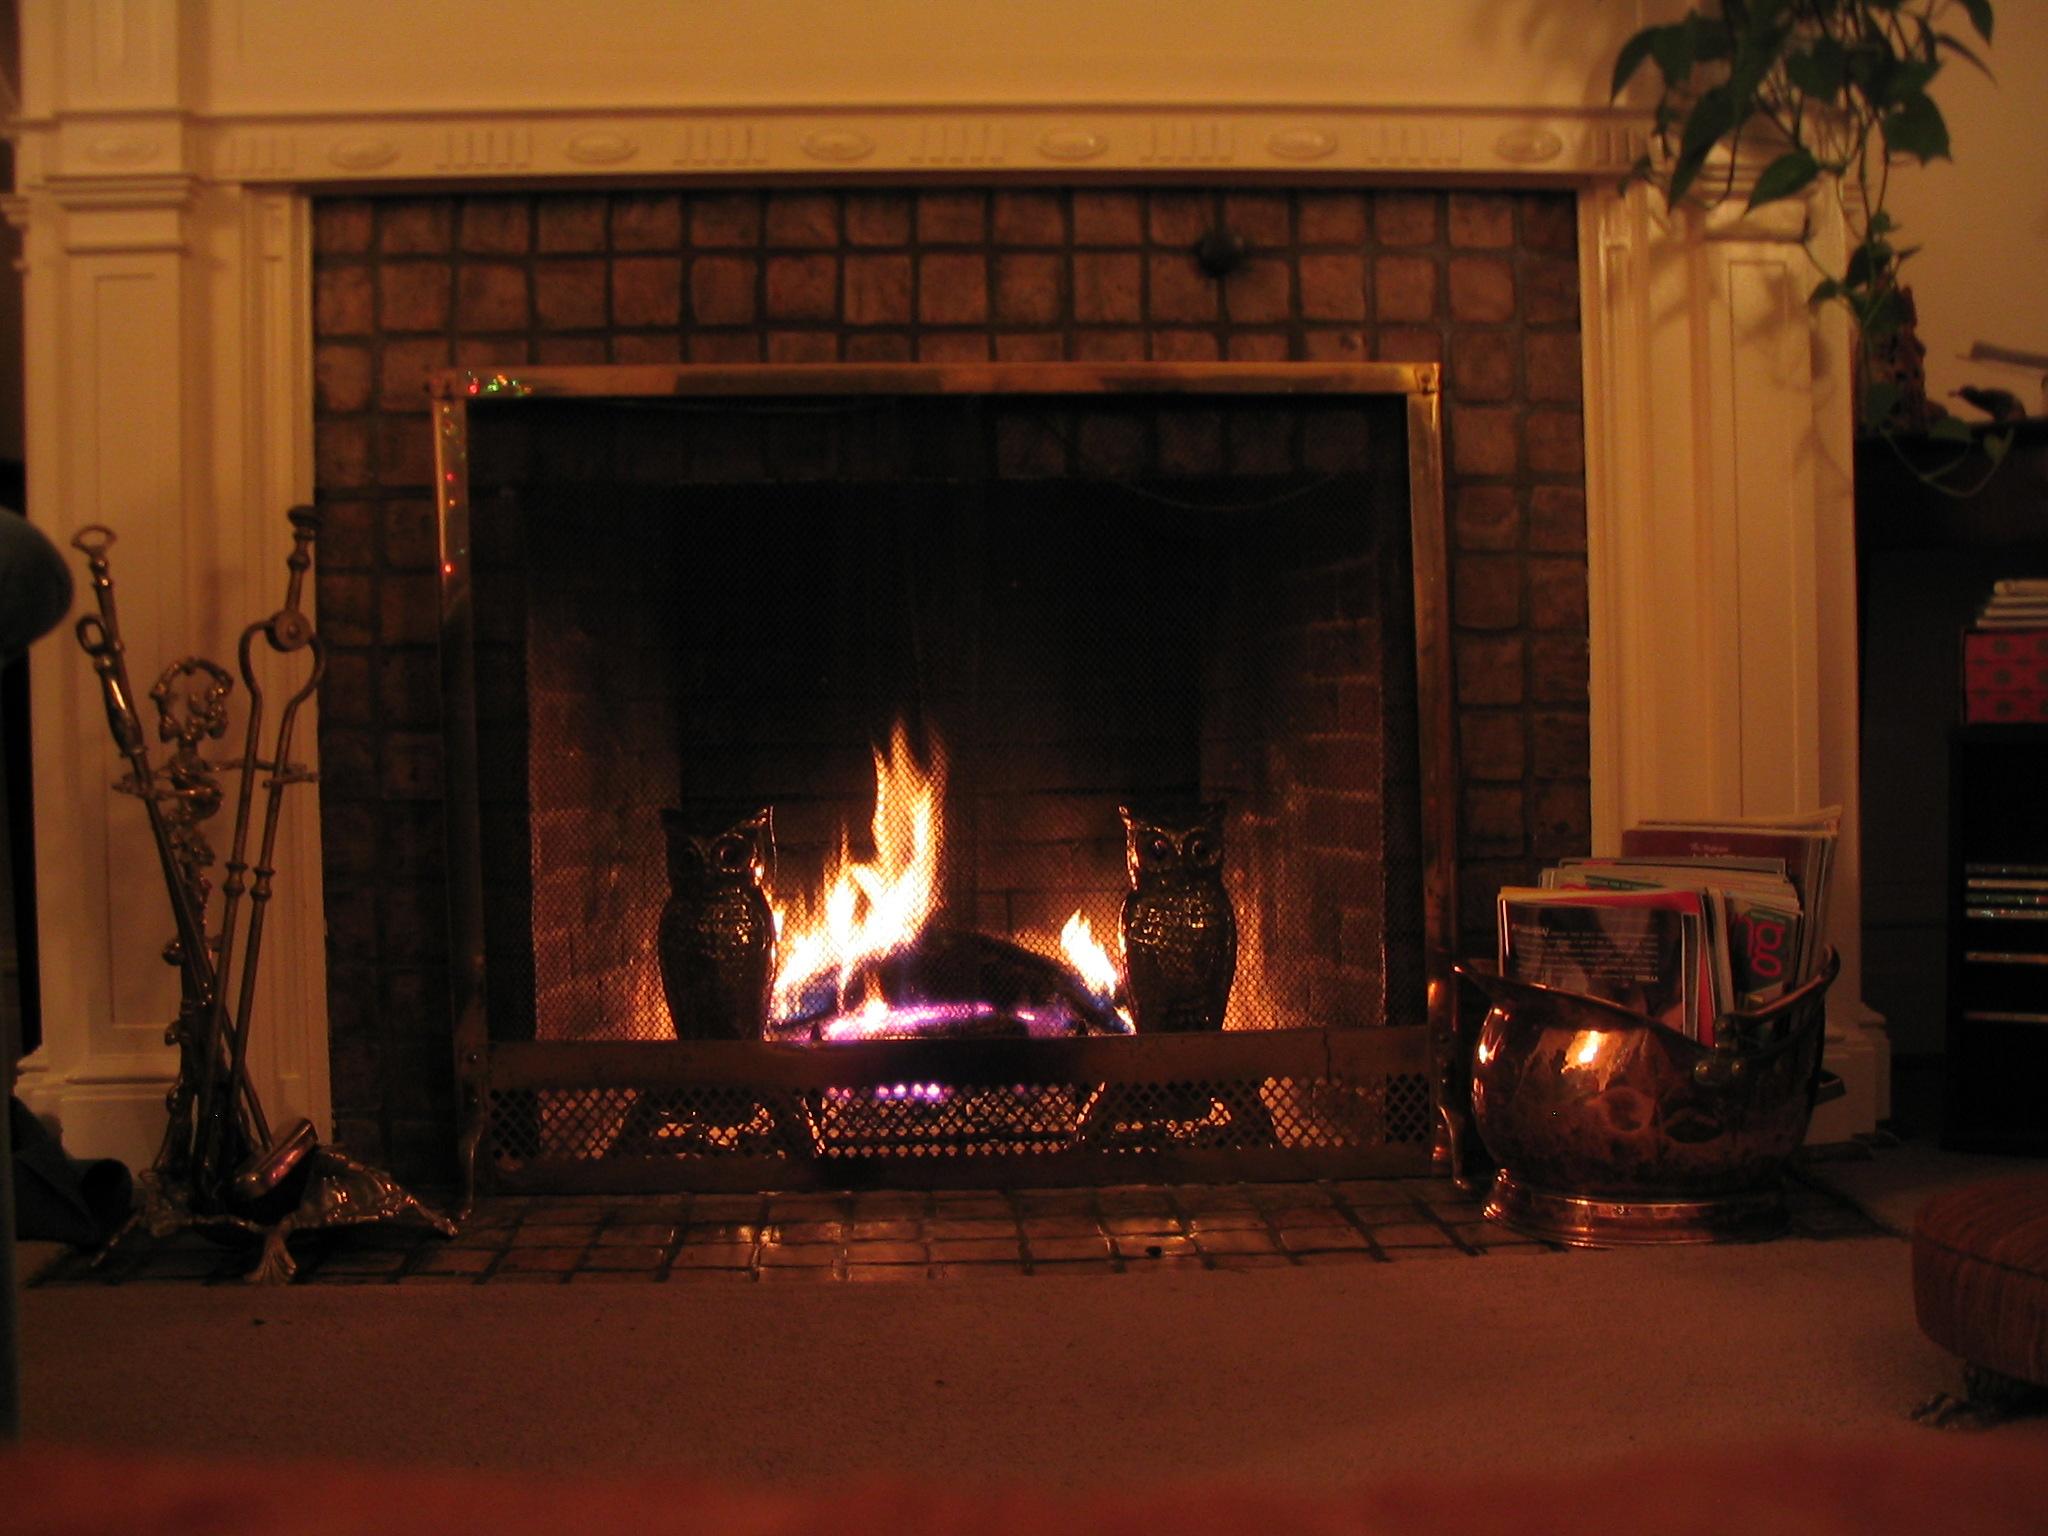 Thefireplace Rsfireplace202048x1536